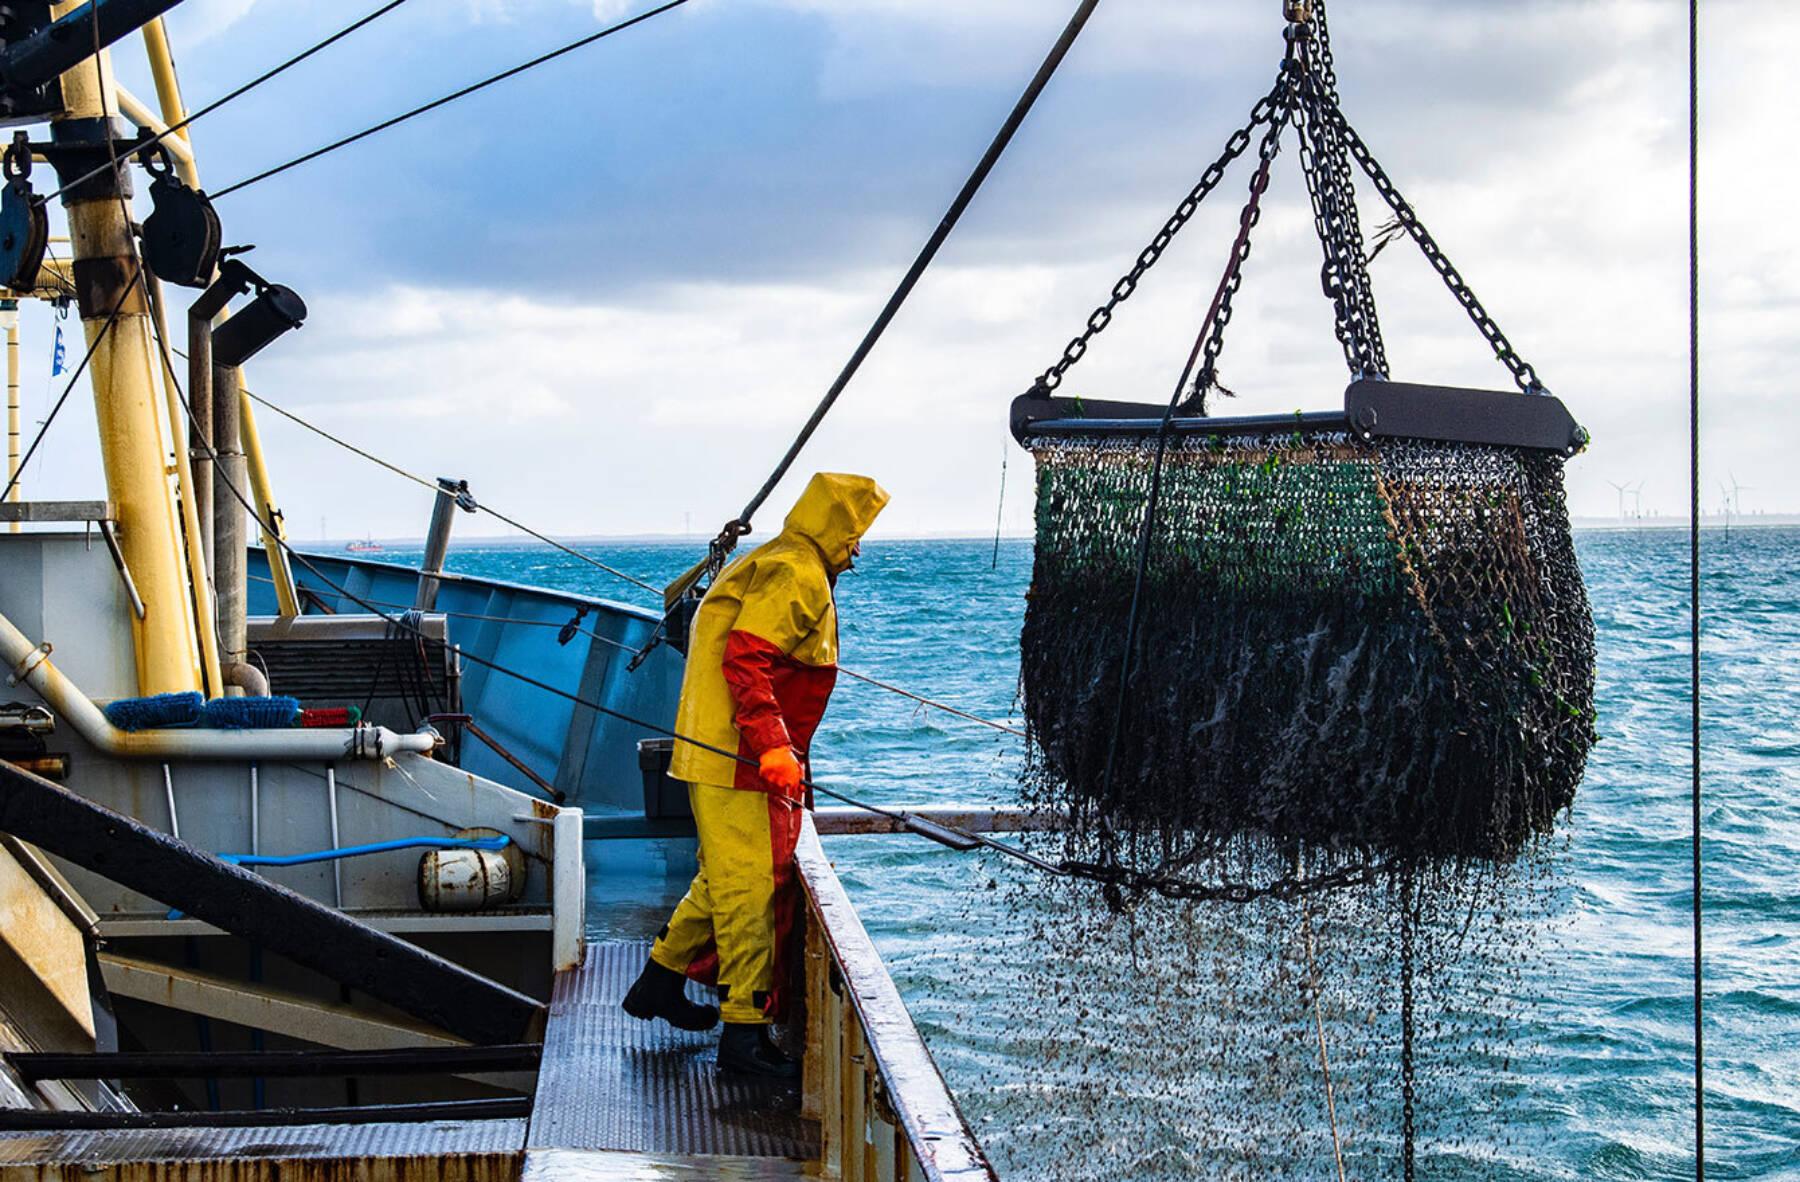 Fisherman from Kilmore Quai working for Atlantis